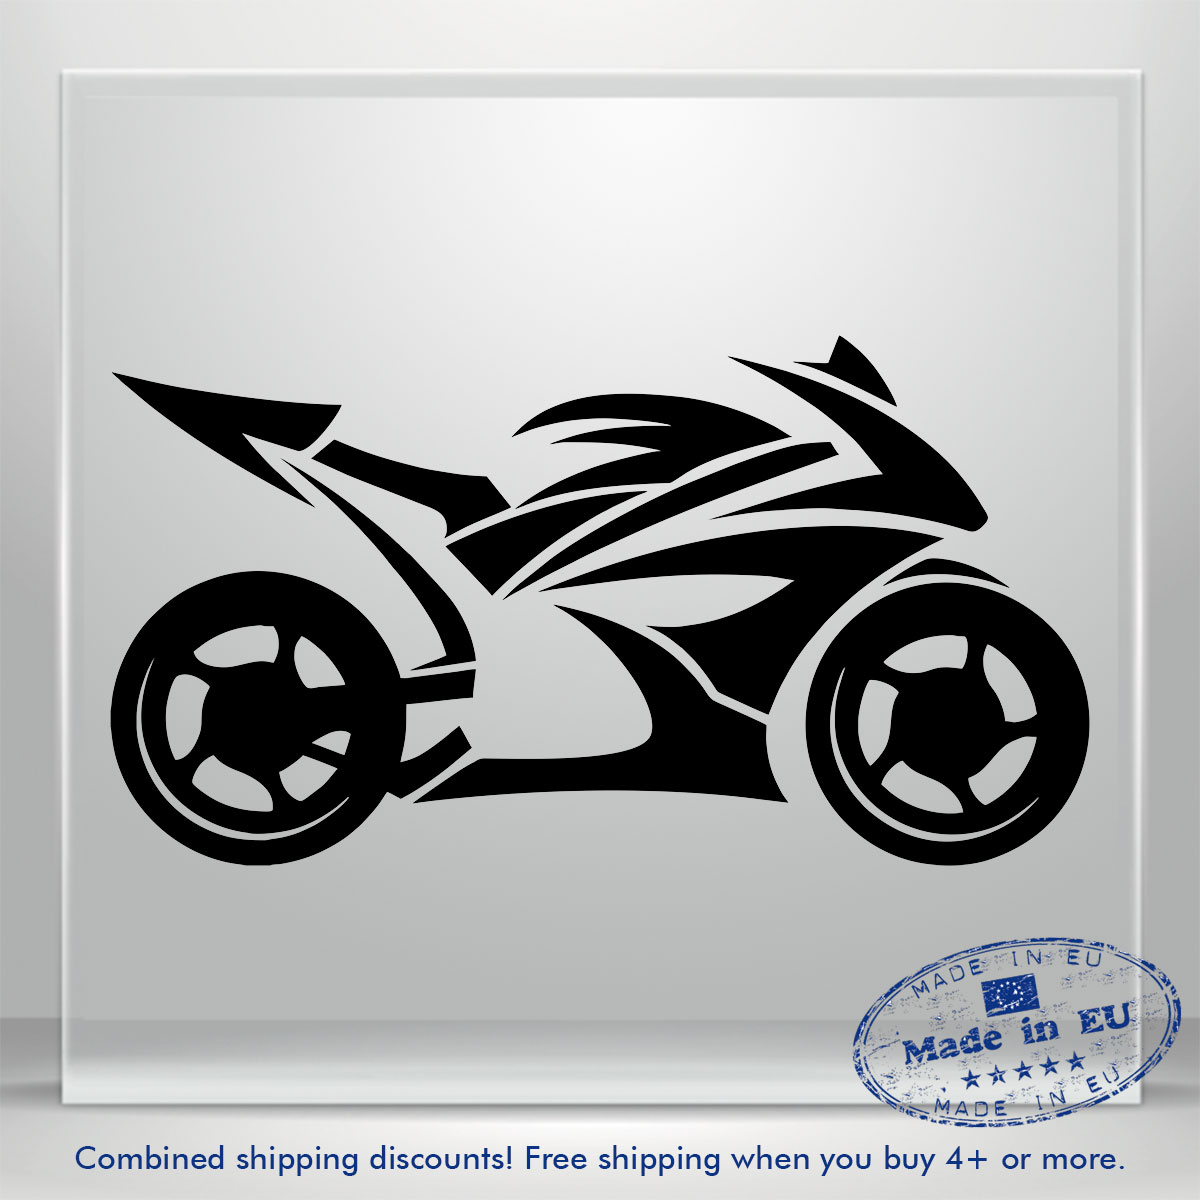 Details about motorcycle motorbike bumper window auto car vinyl decal sticker bike honda bmw